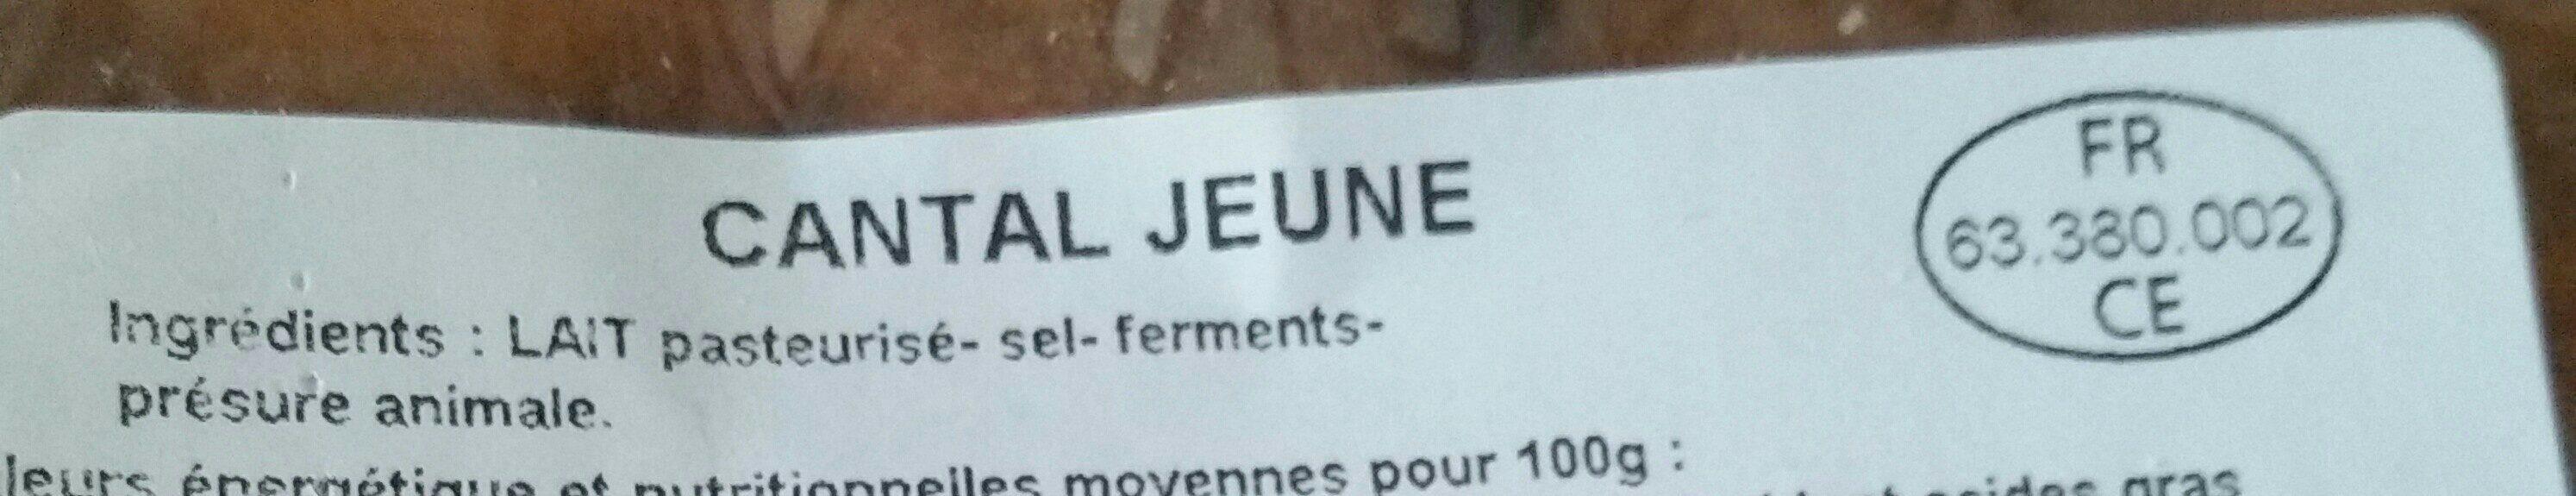 Cantal jeune - Ingredients - fr